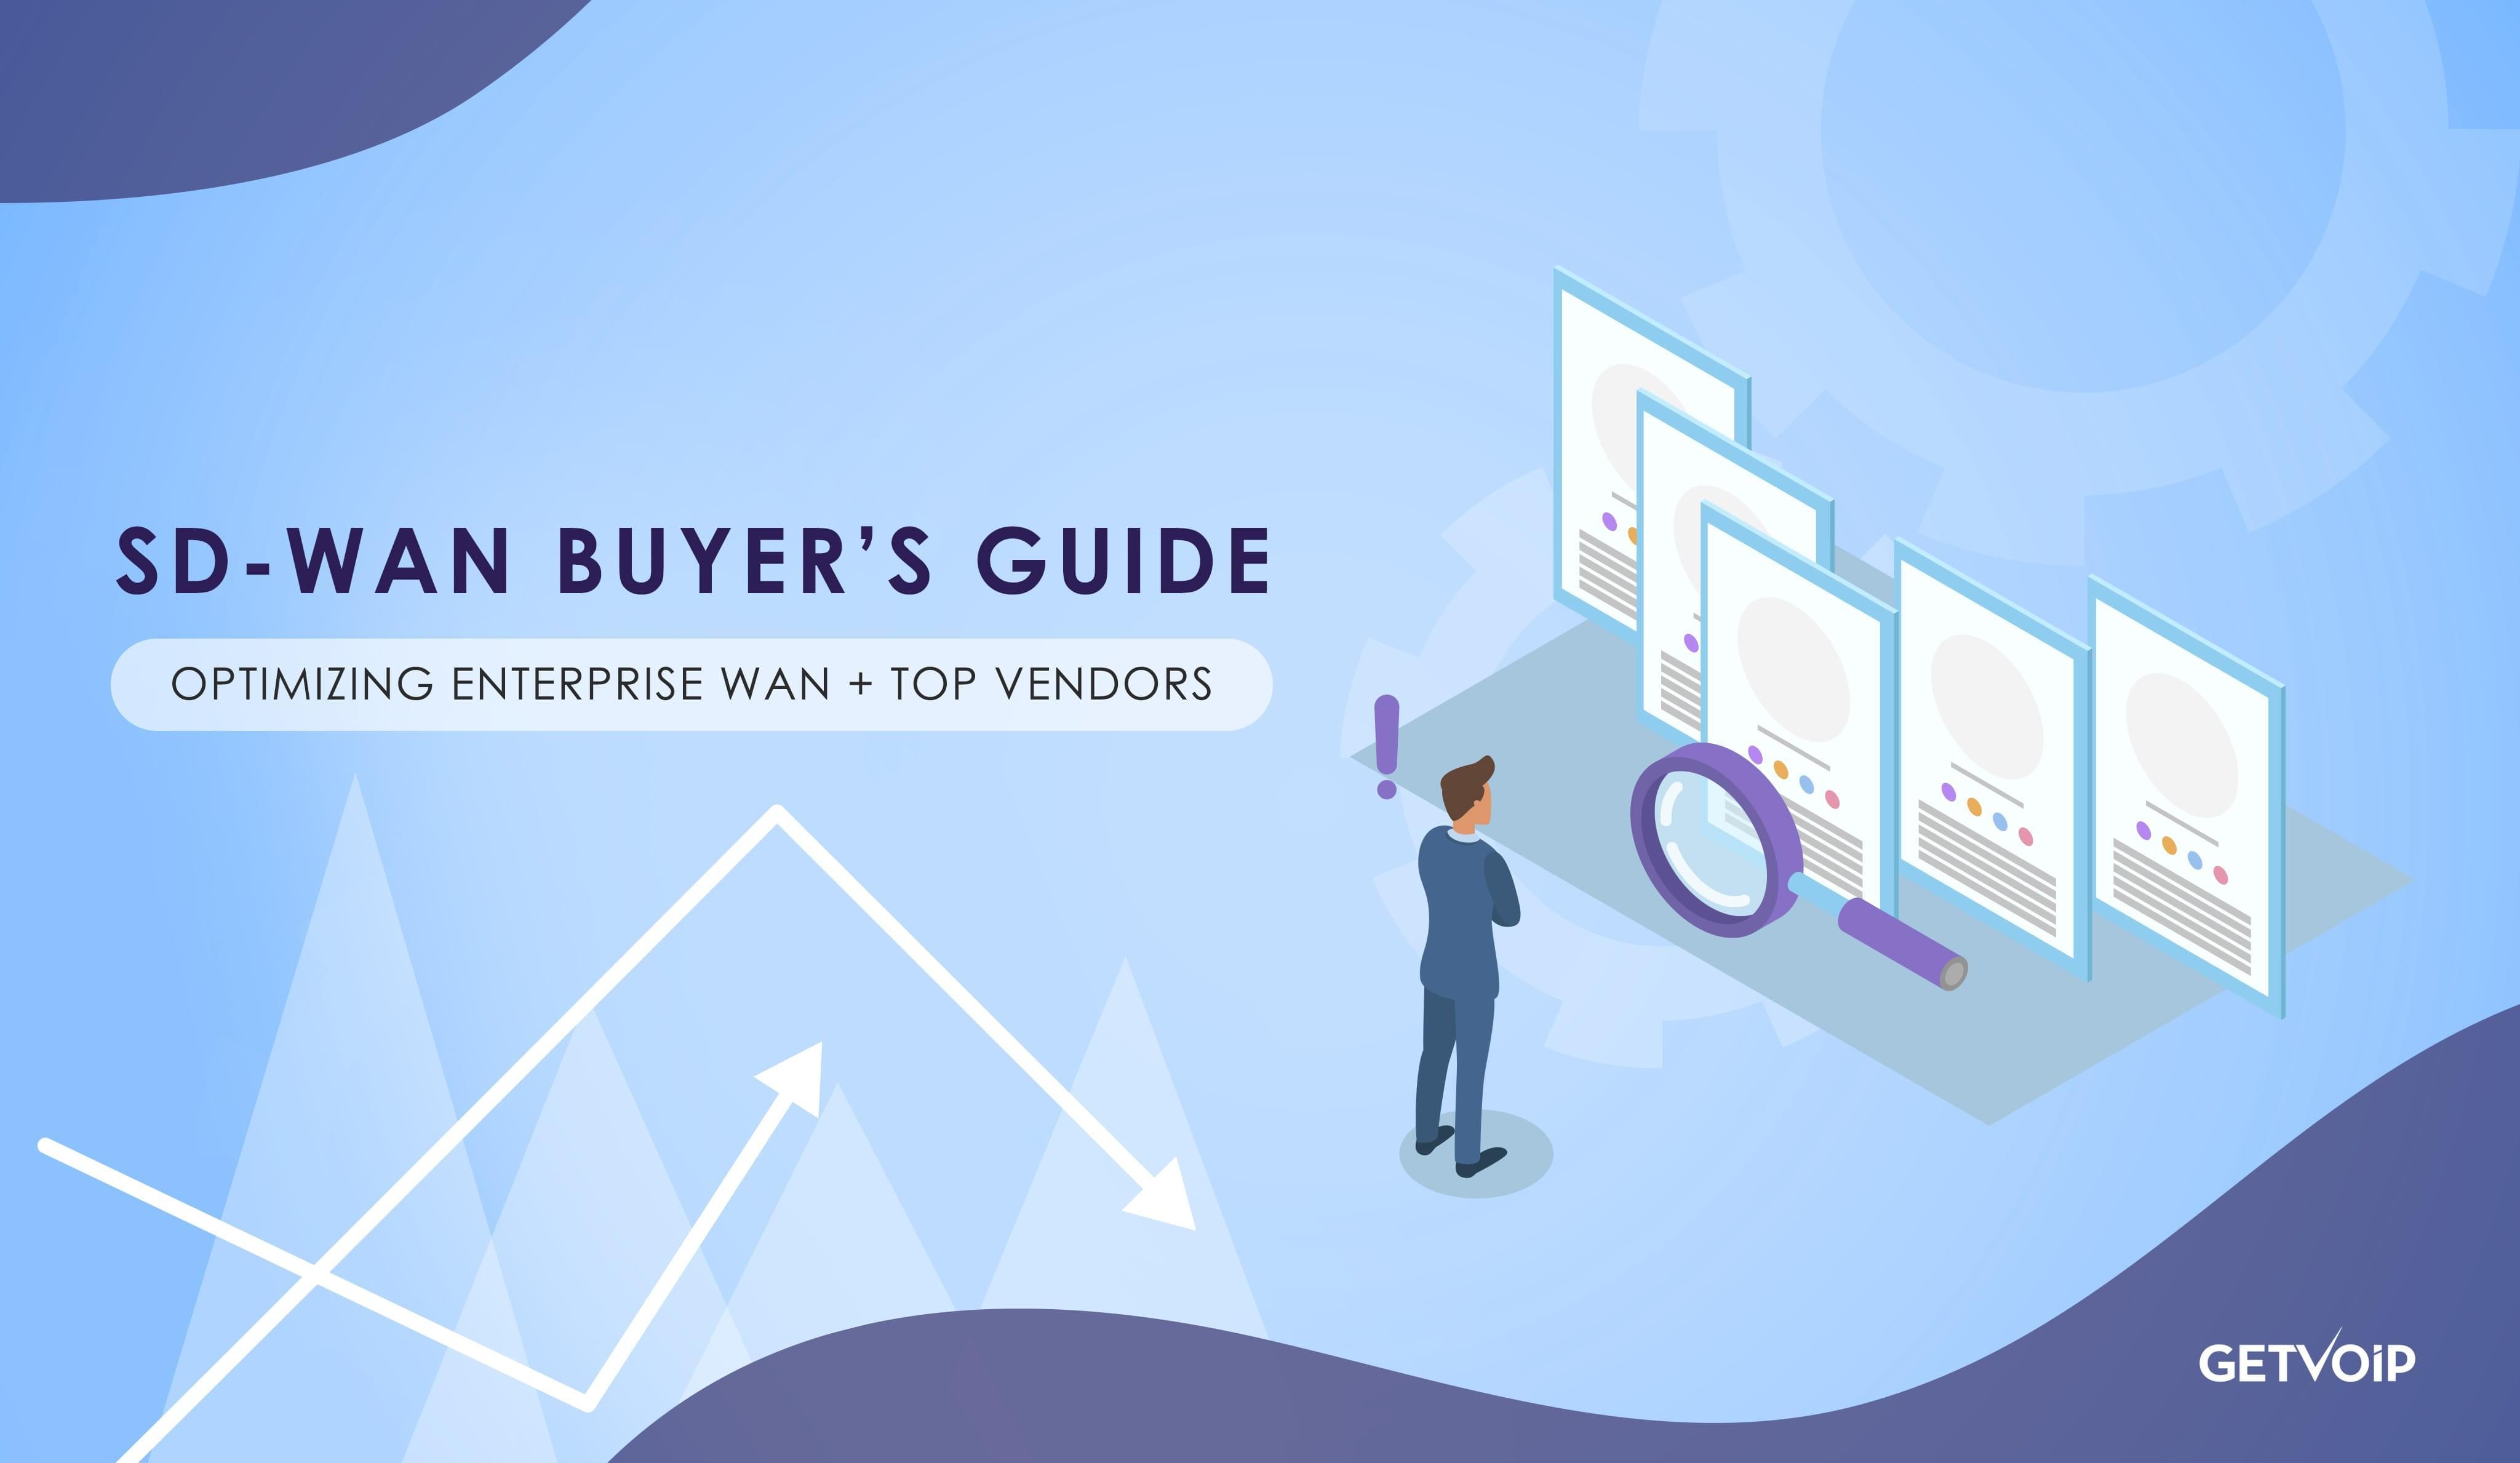 SD-WAN Buyer's Guide – Optimizing Enterprise WAN + Top Vendors